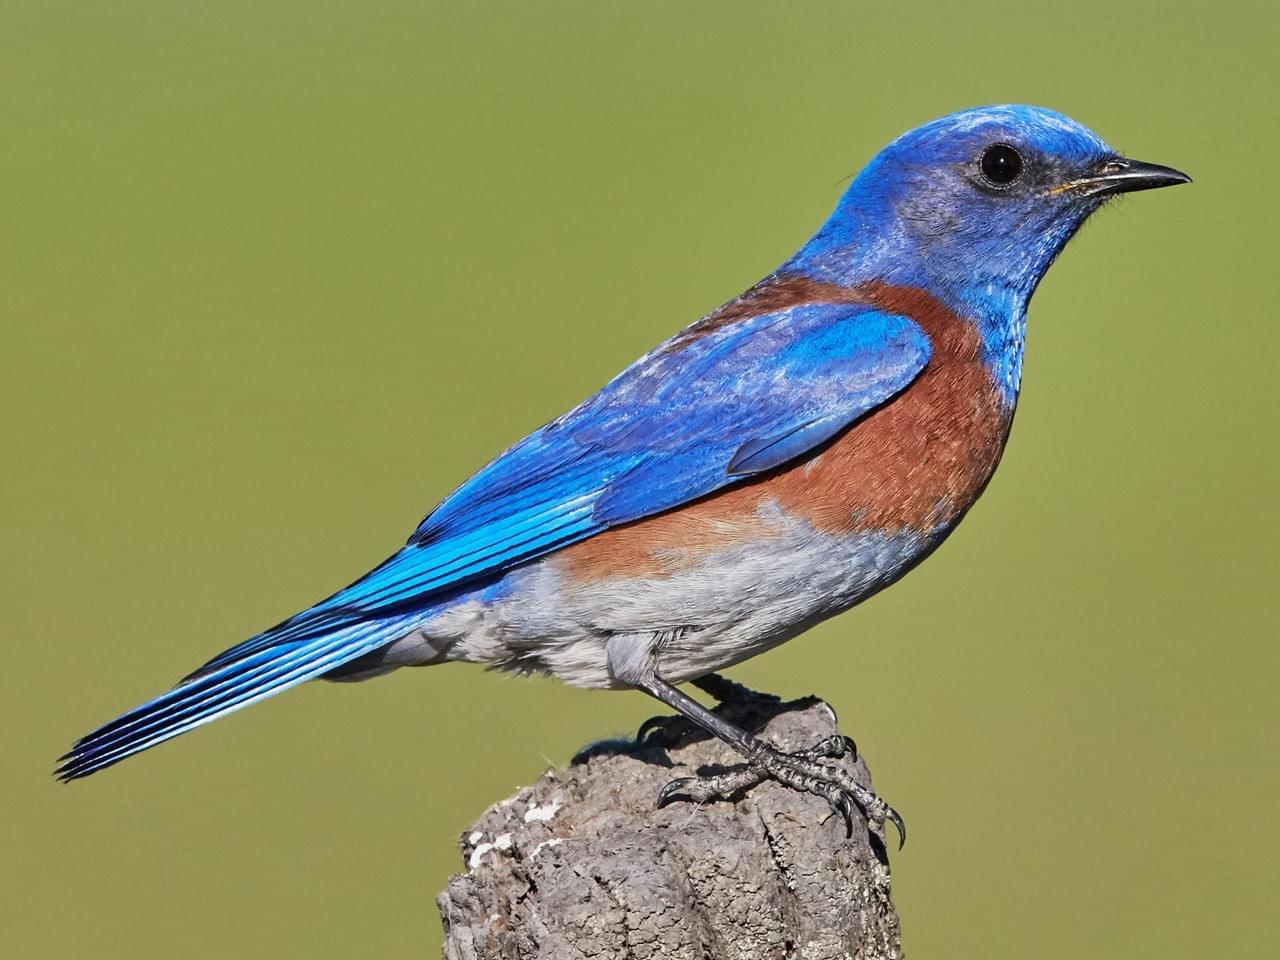 Blue Bird image